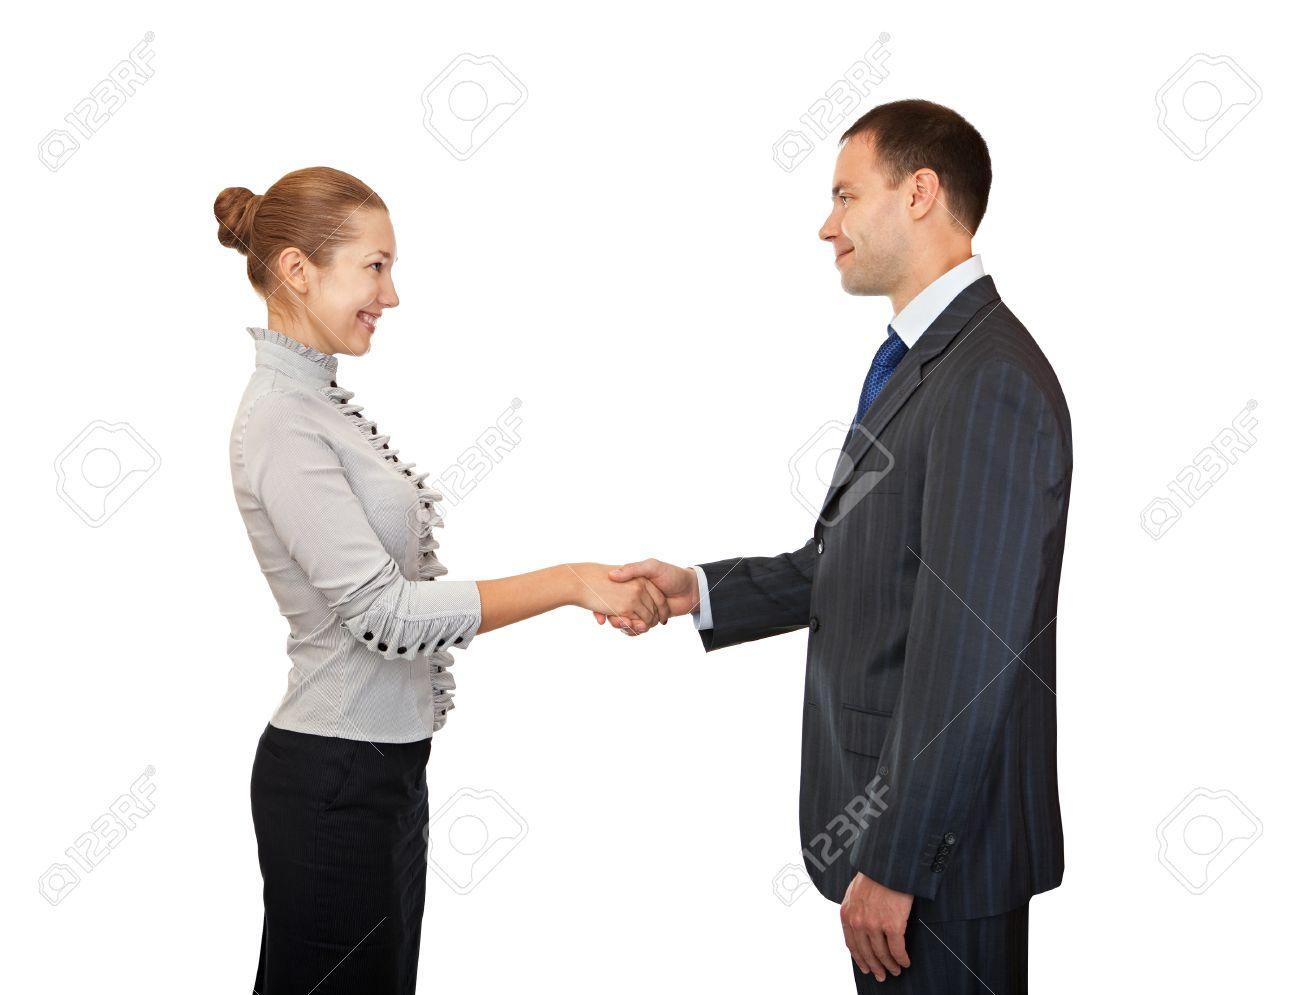 Business people handshake greeting deal at work photo free download - Handshake Man And Women Greeting Business People Stock Photo 35115616